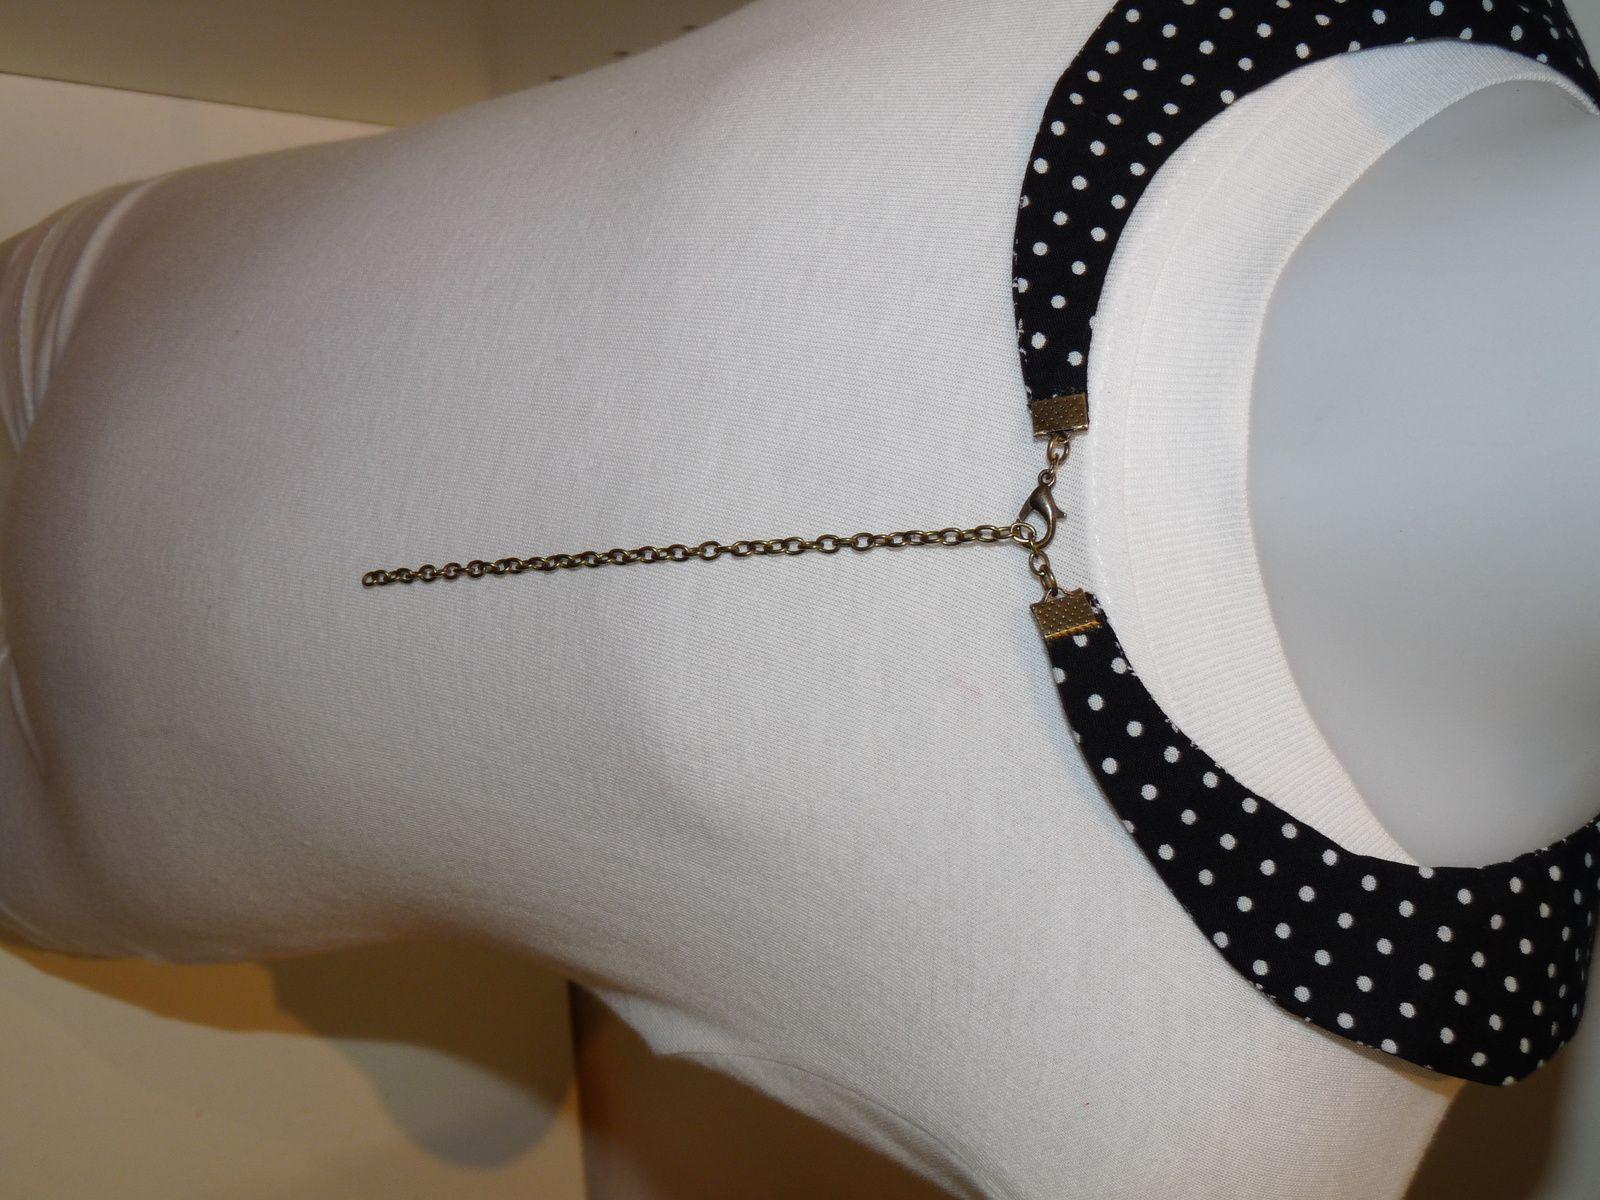 collier col claudine ajustable l encolure. Black Bedroom Furniture Sets. Home Design Ideas